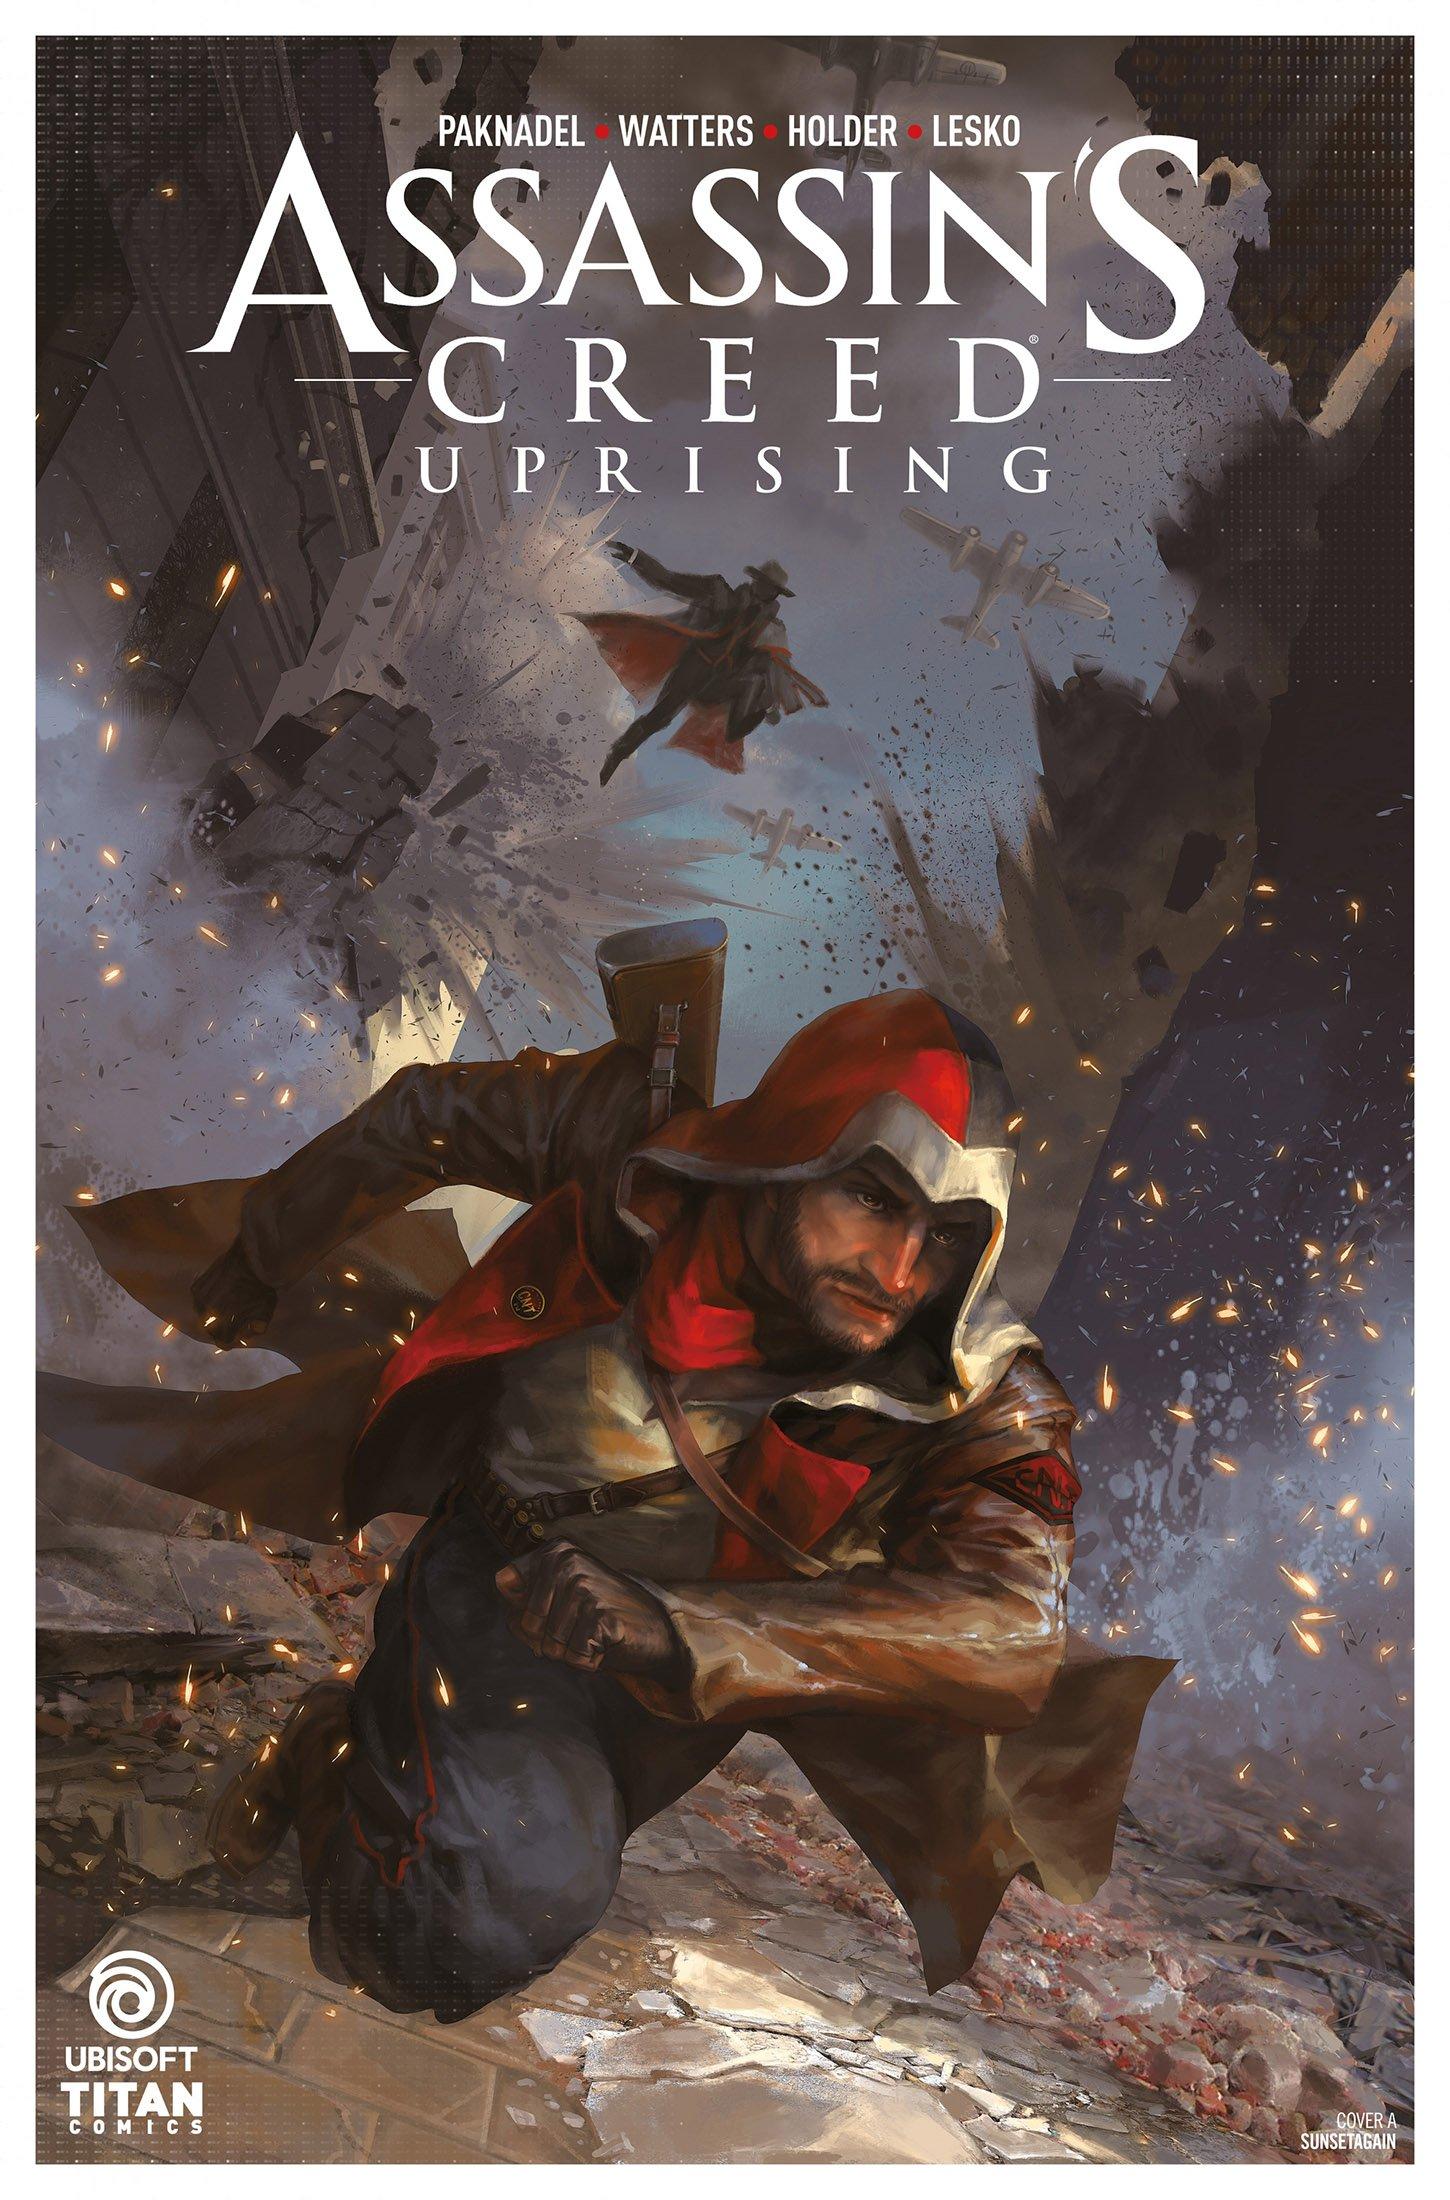 Assassin's Creed - Uprising 07 (November 2017) (cover a)